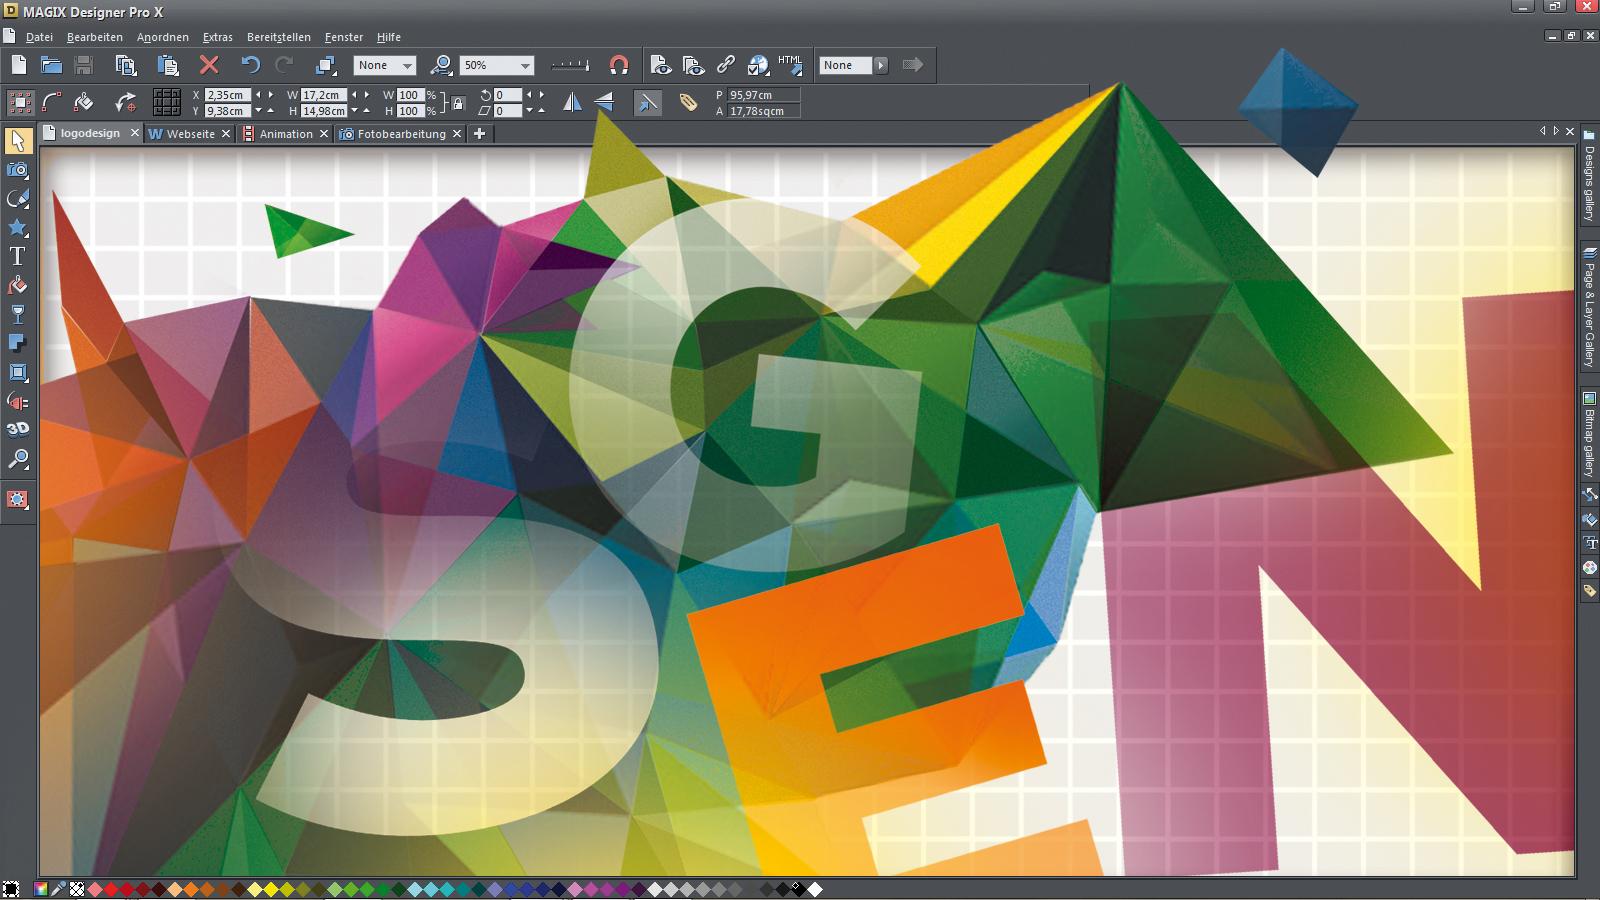 Magix Xara Designer Pro X - Test / Review - game2gether